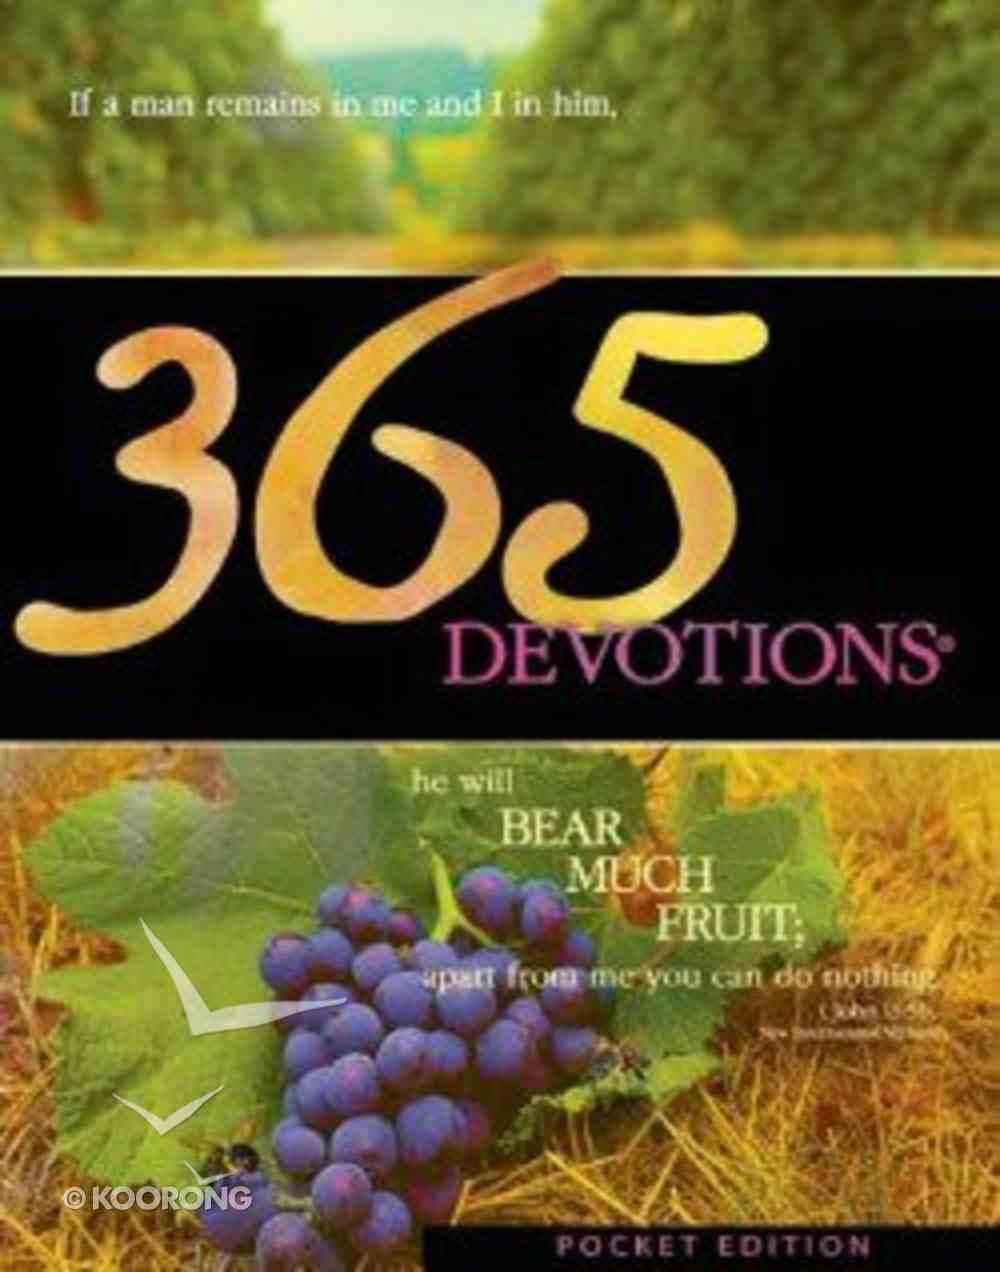 365 Devotions (2005 Pocket Edition) Paperback